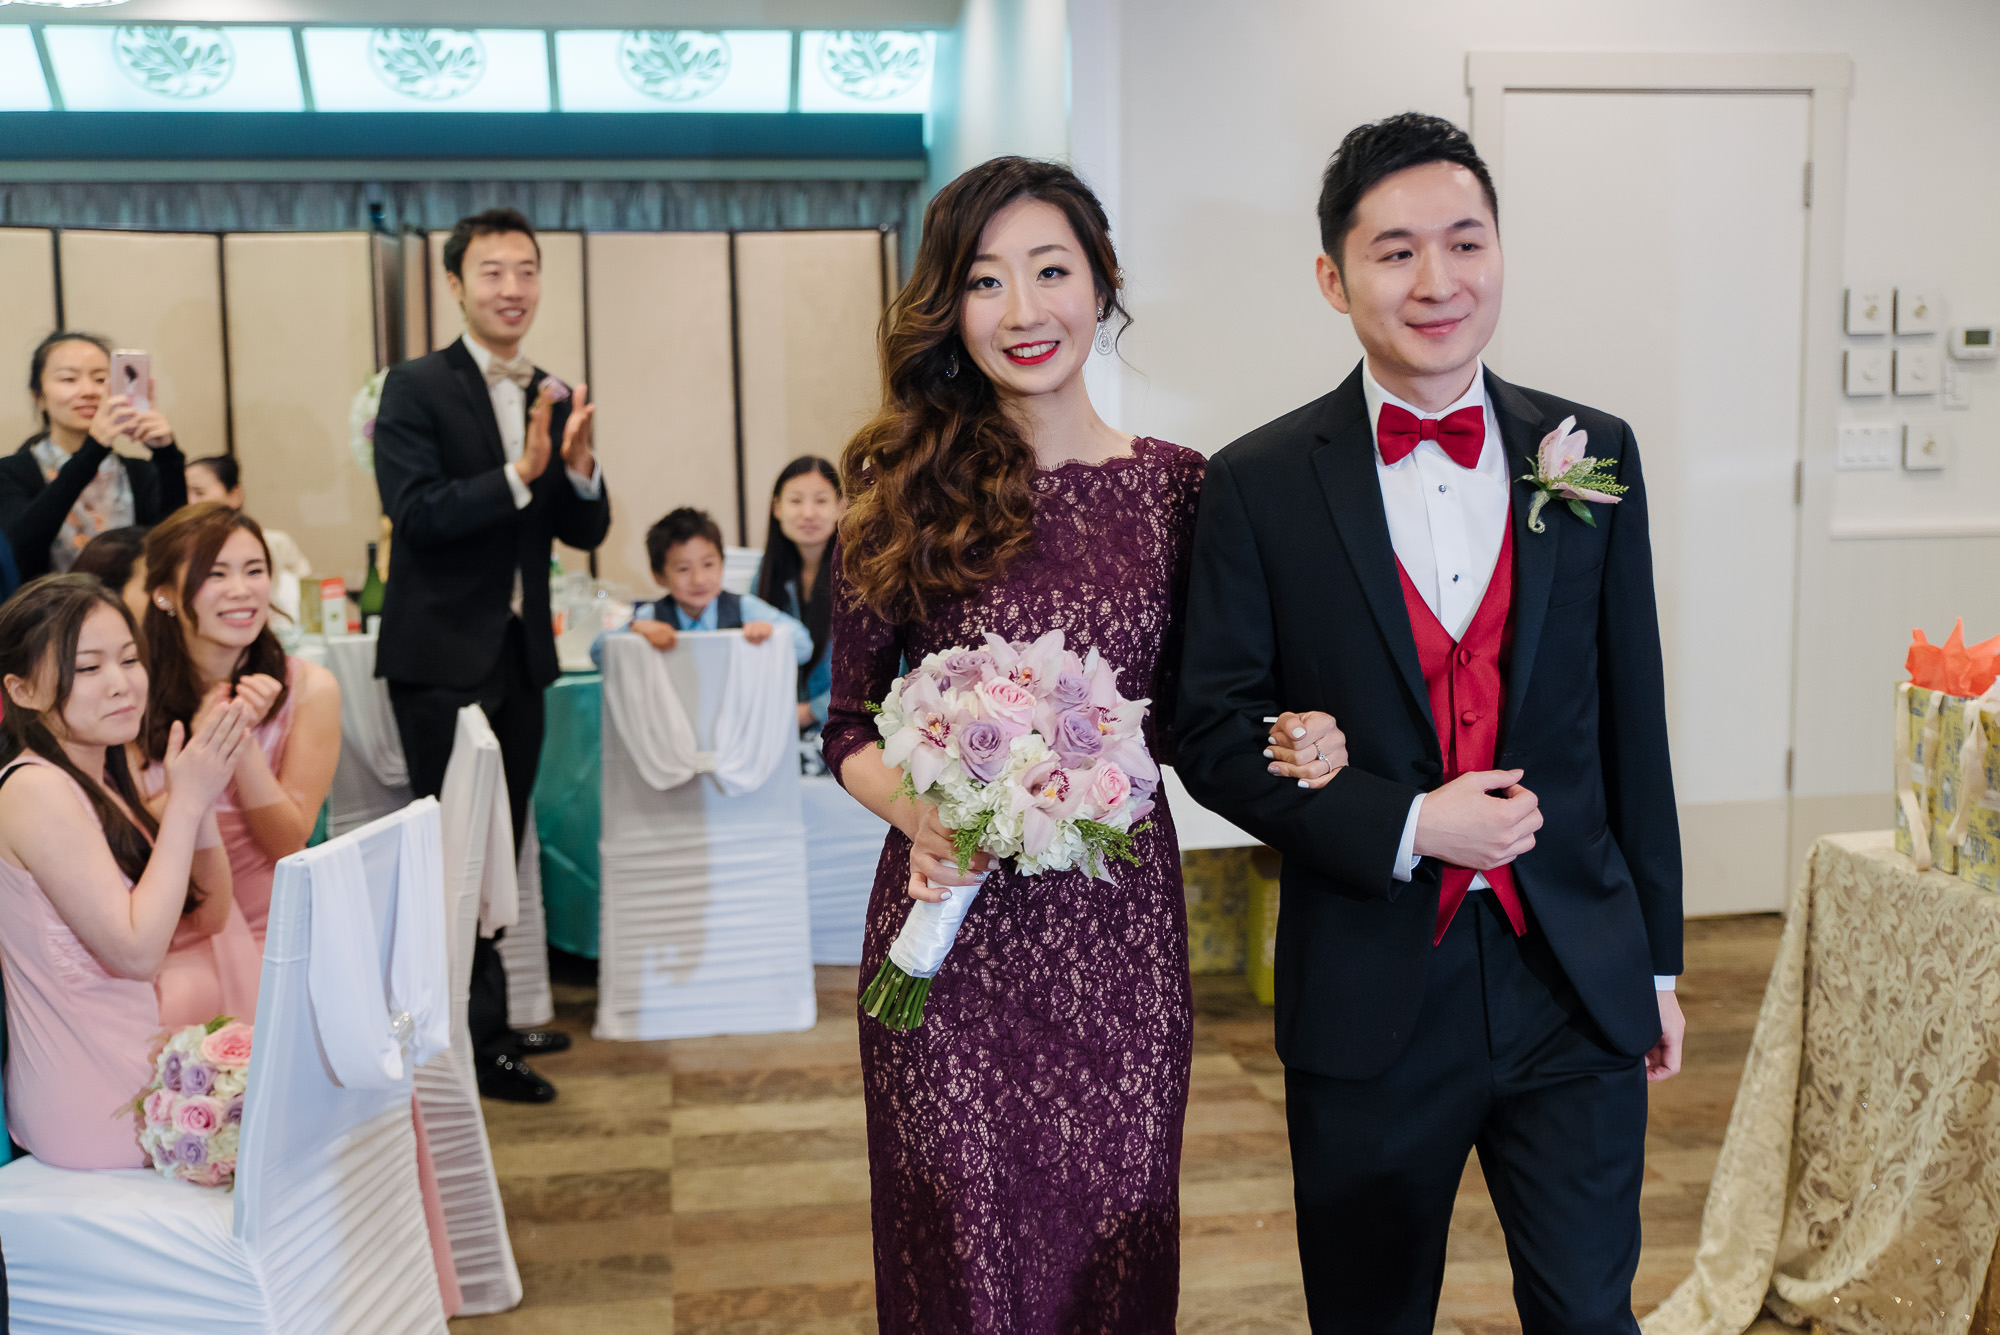 richmond_wedding_reception 1853552.jpg